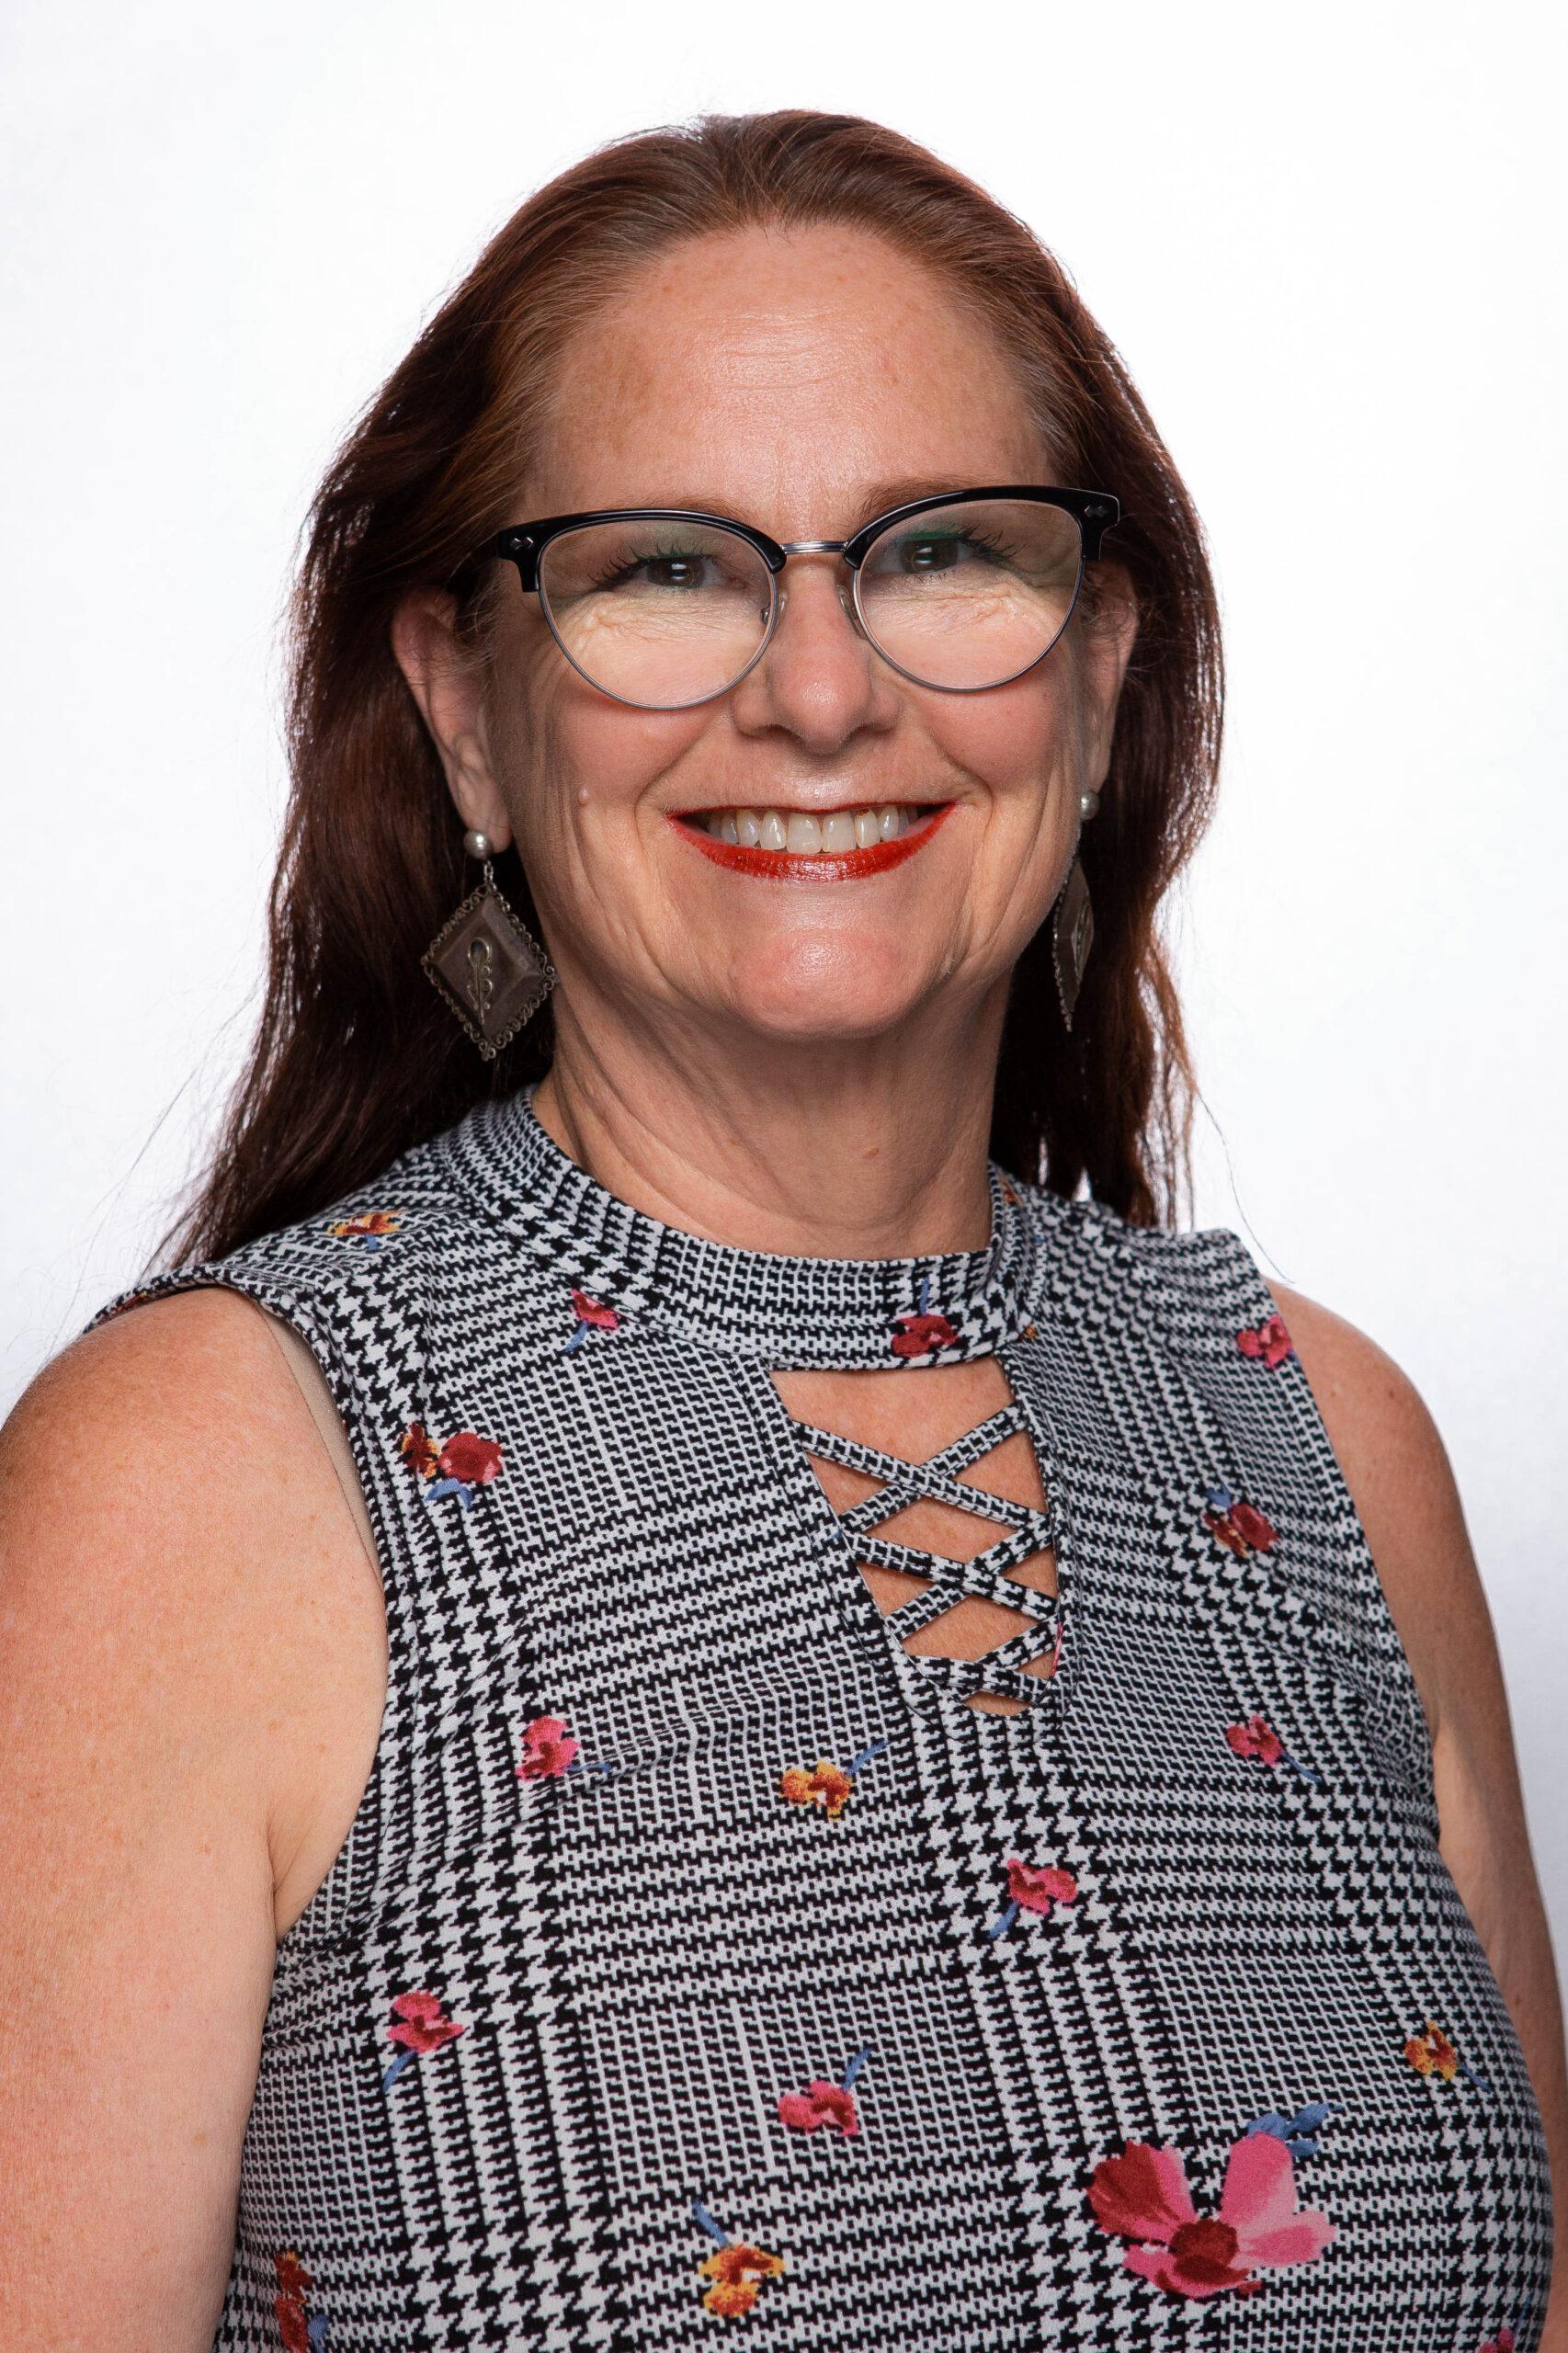 Lcu: Lcu Directory - Carole Carroll Ph.d. pertaining to Texas Tech Academic Calendar